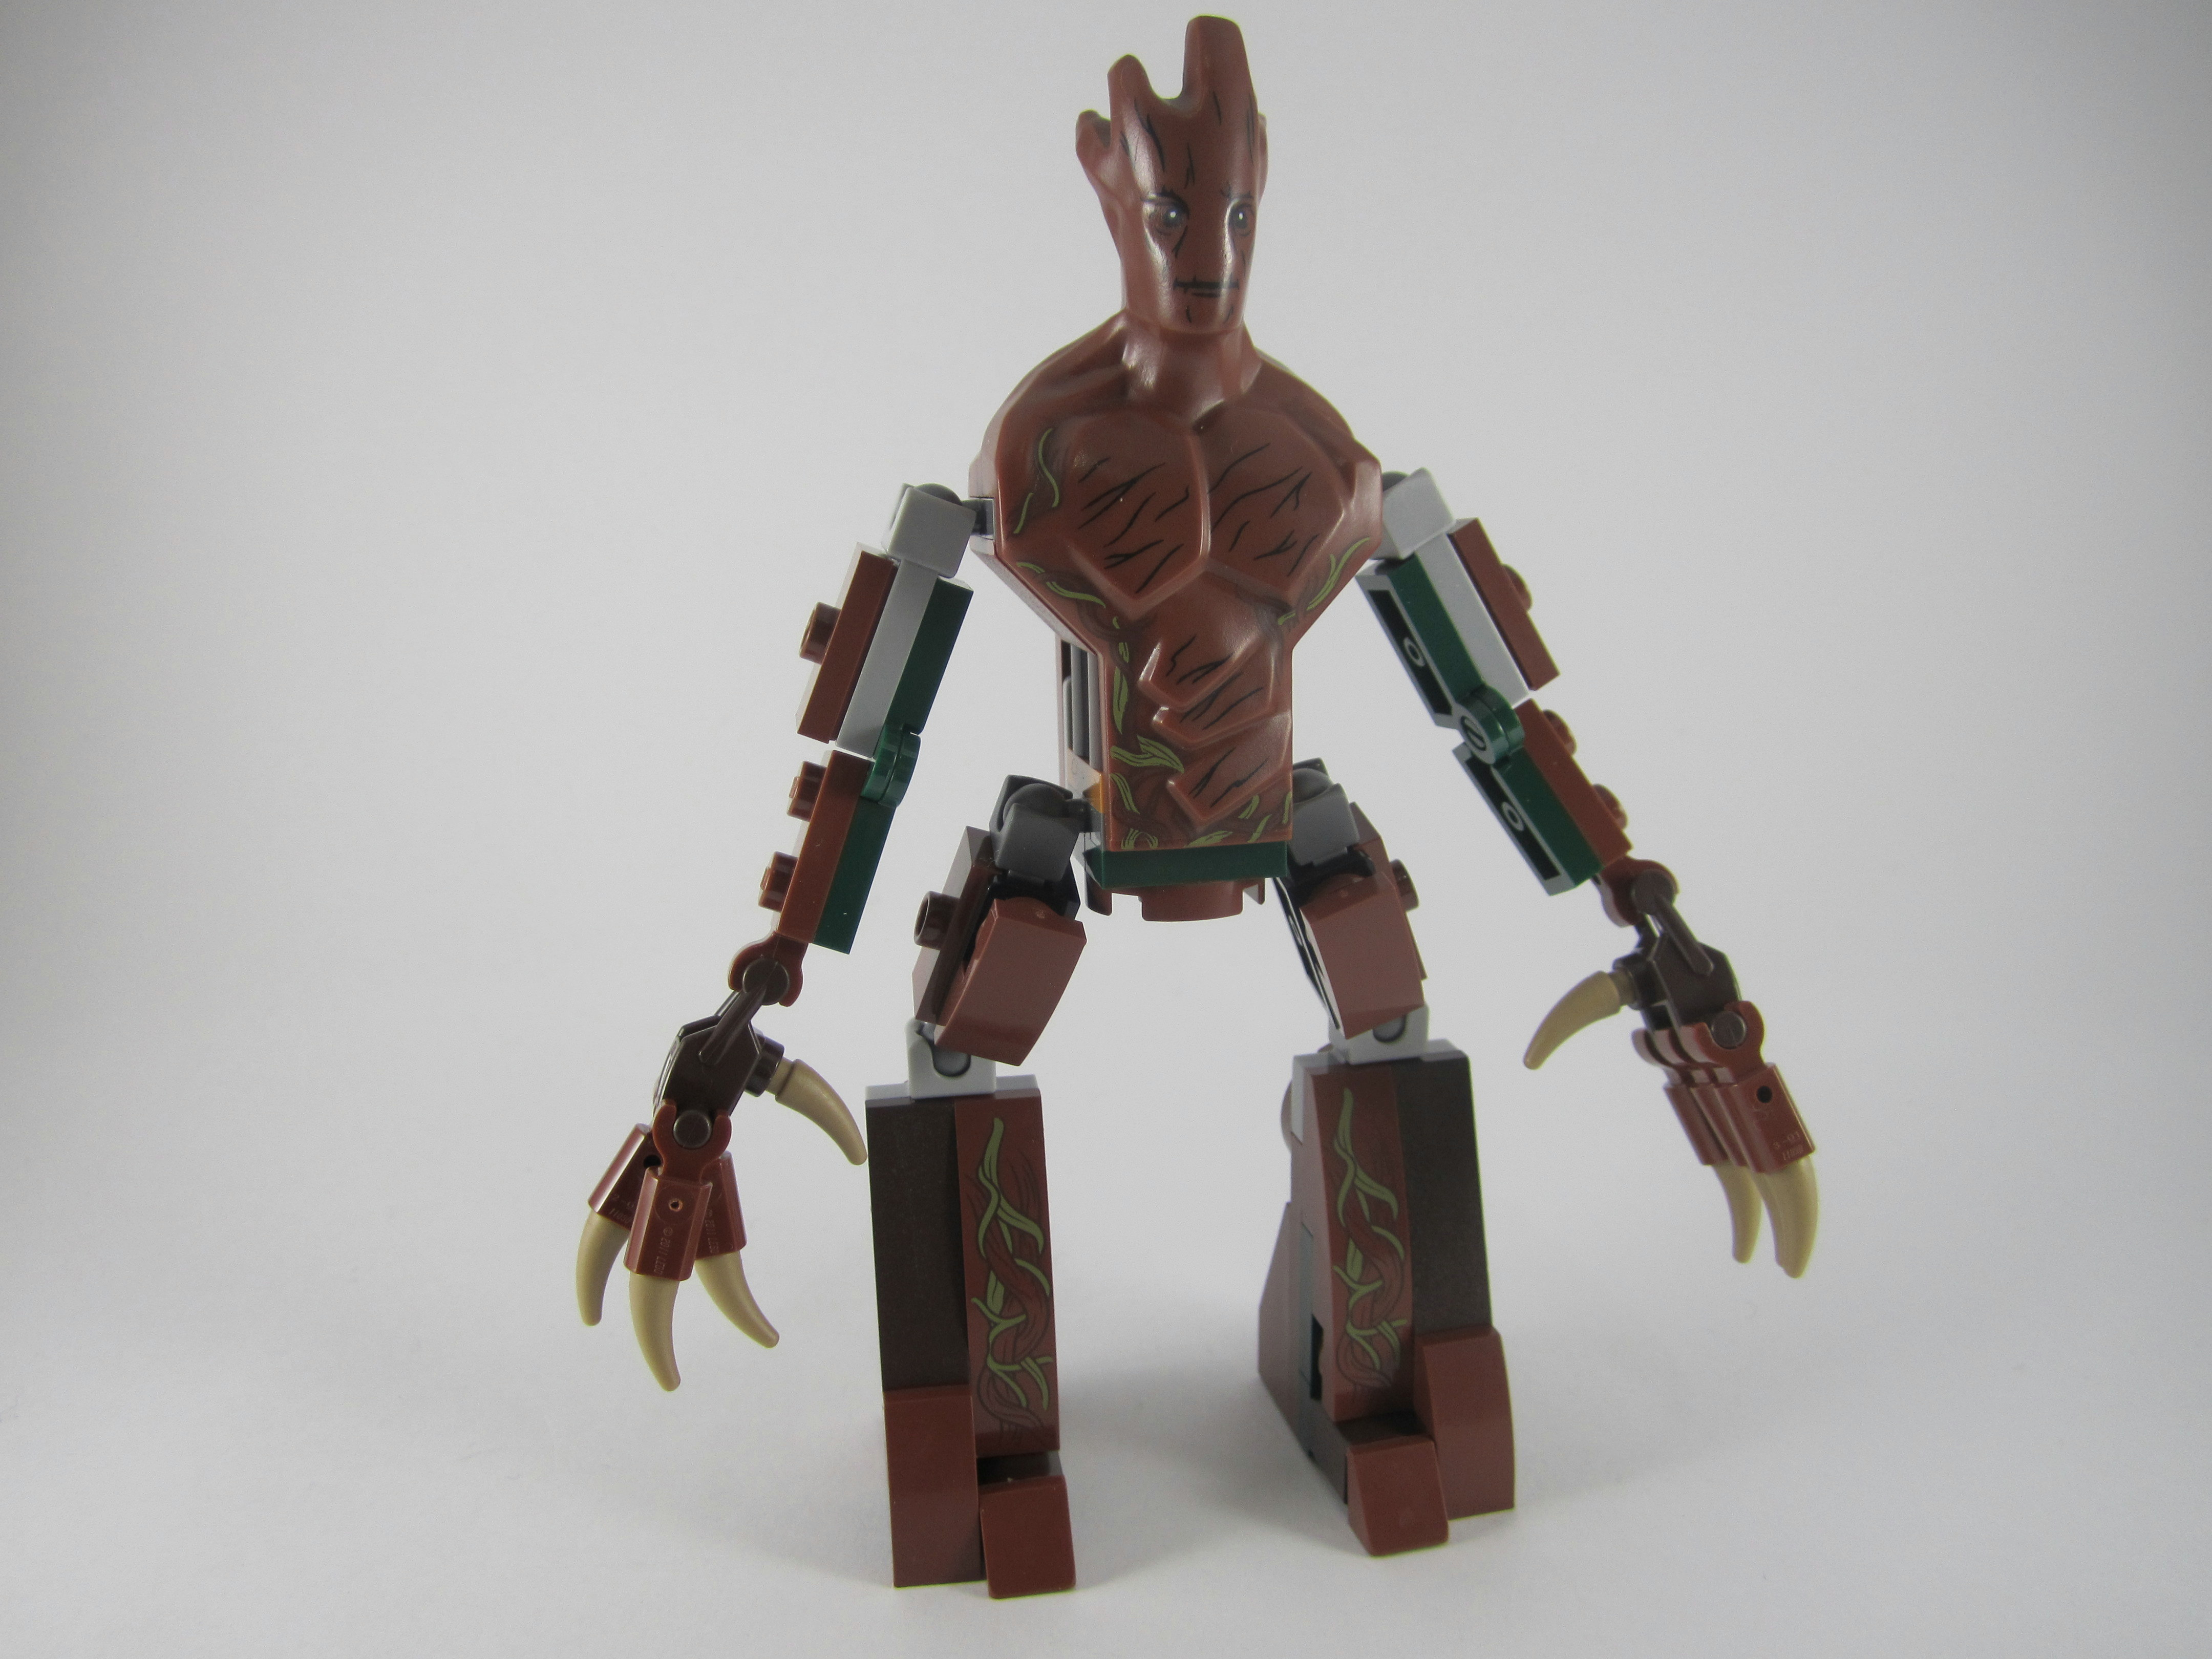 Lego Groot Big Figure Guardians of the Galaxy Super Heroes 76020